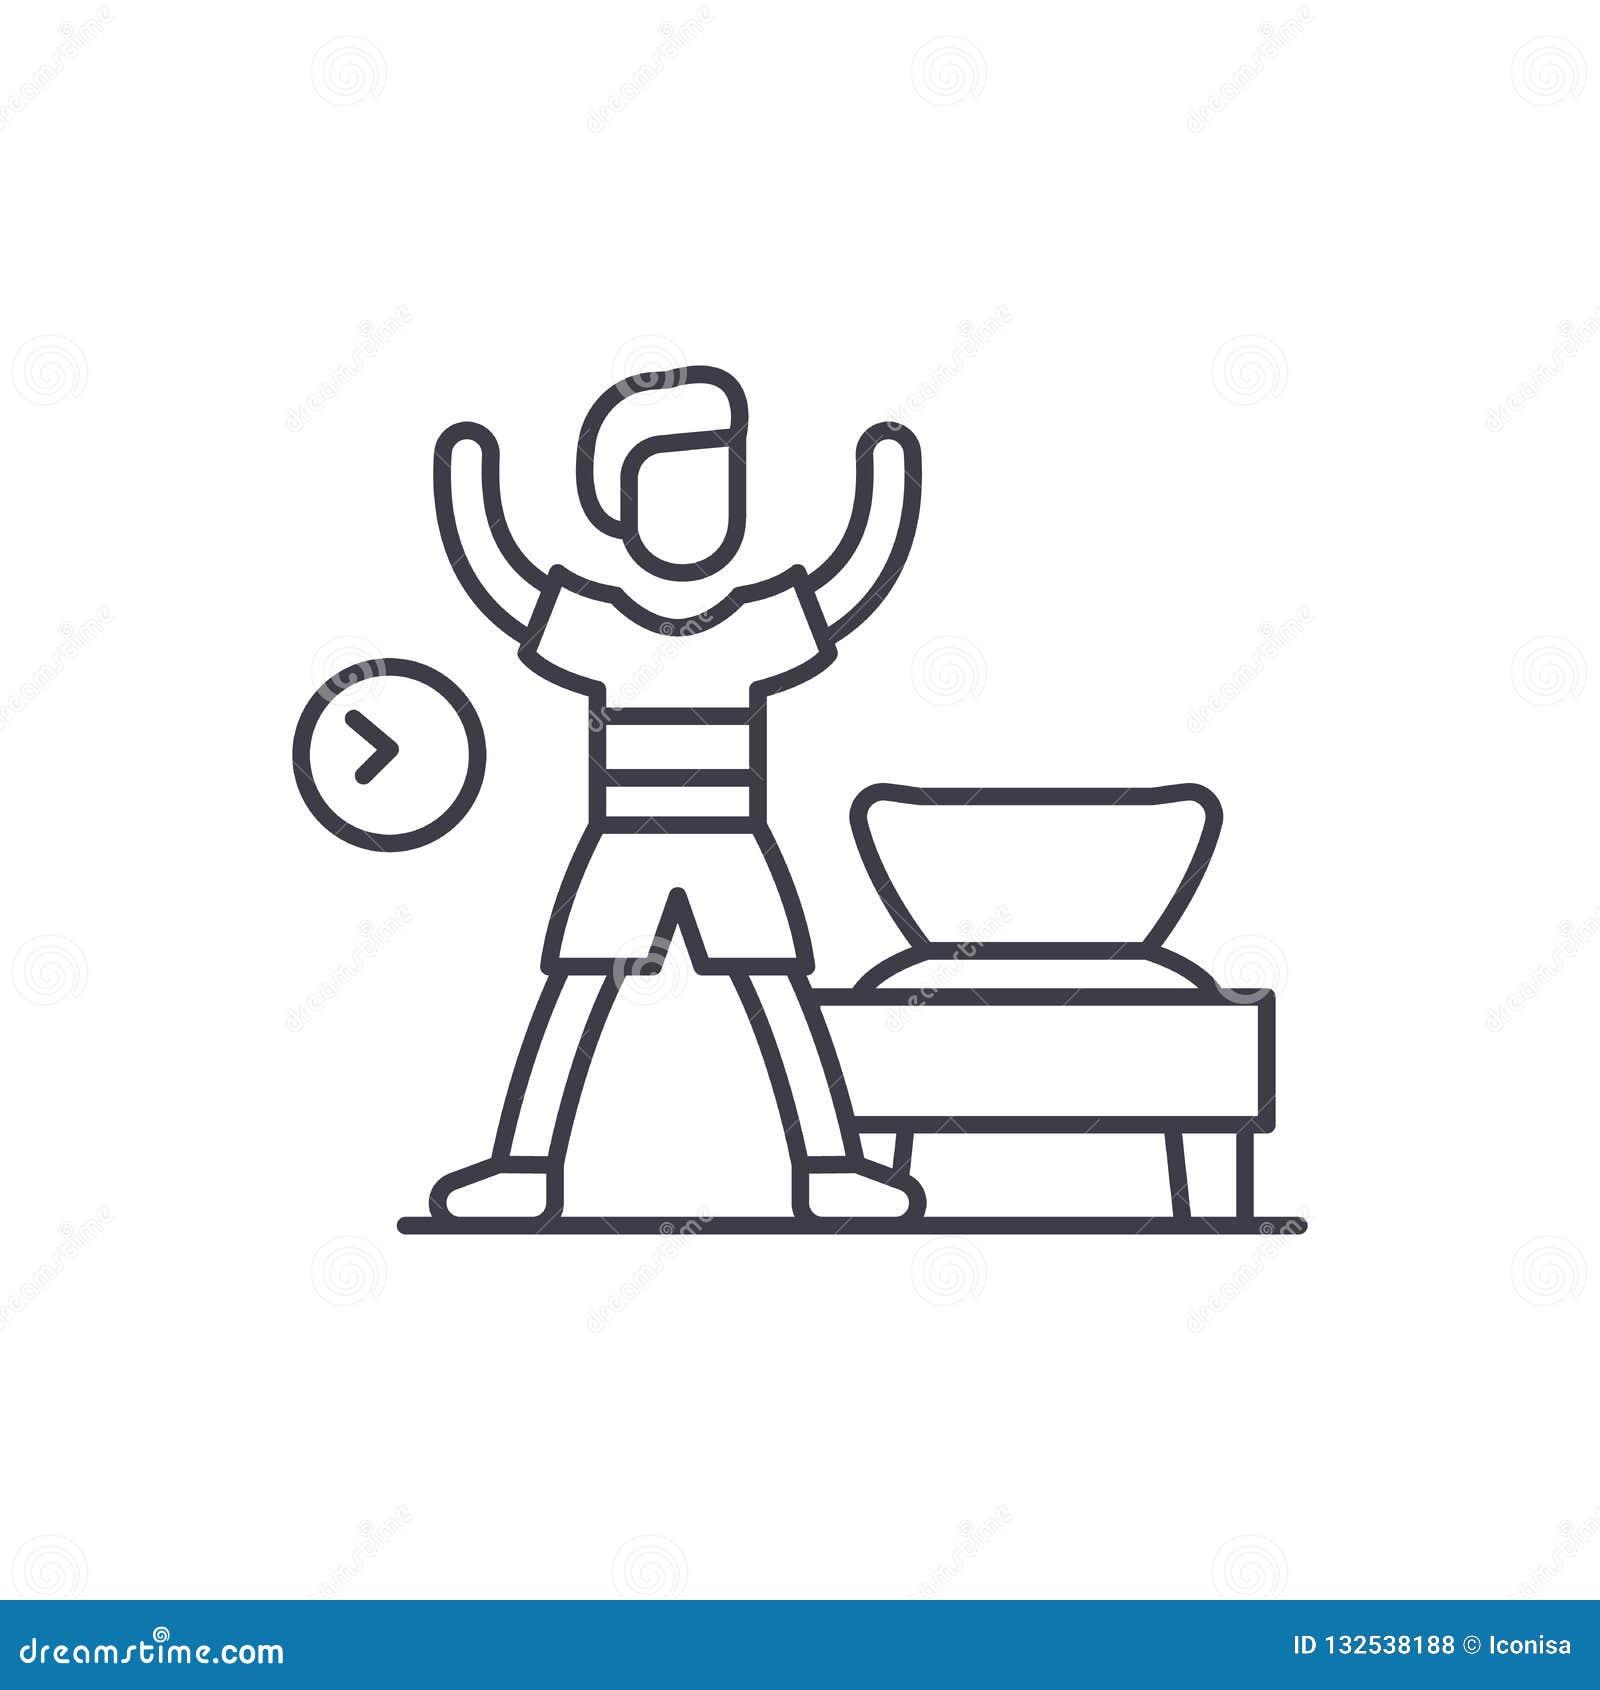 Morning gymnastics line icon concept. Morning gymnastics vector linear illustration, symbol, sign